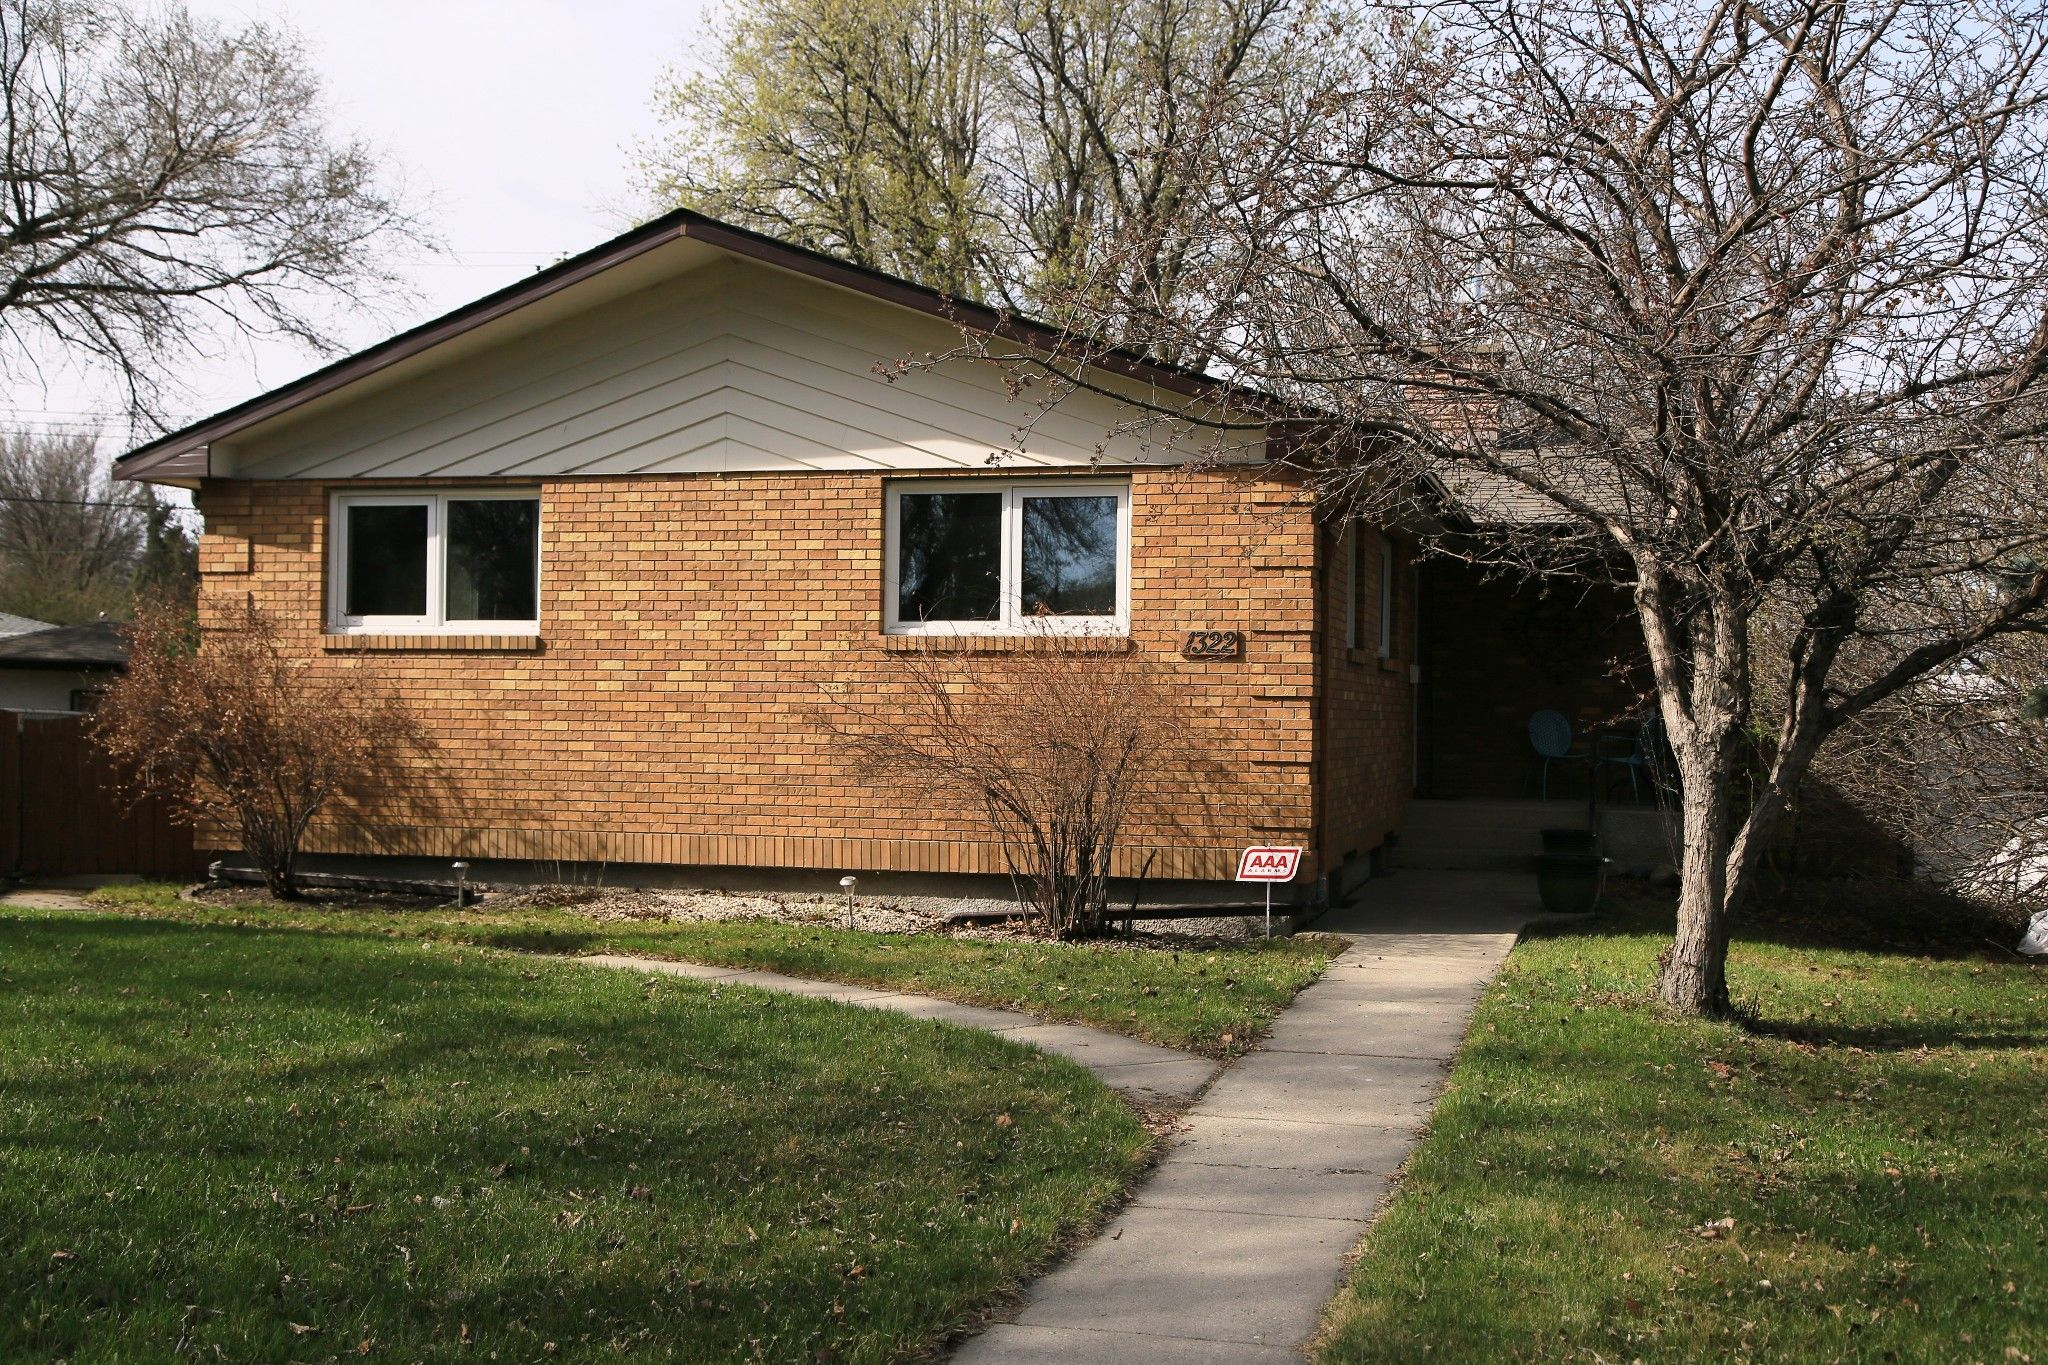 Photo 2: Photos: 1322 Valour Road in Winnipeg: Sargent Park Single Family Detached for sale (5C)  : MLS®# 1811835